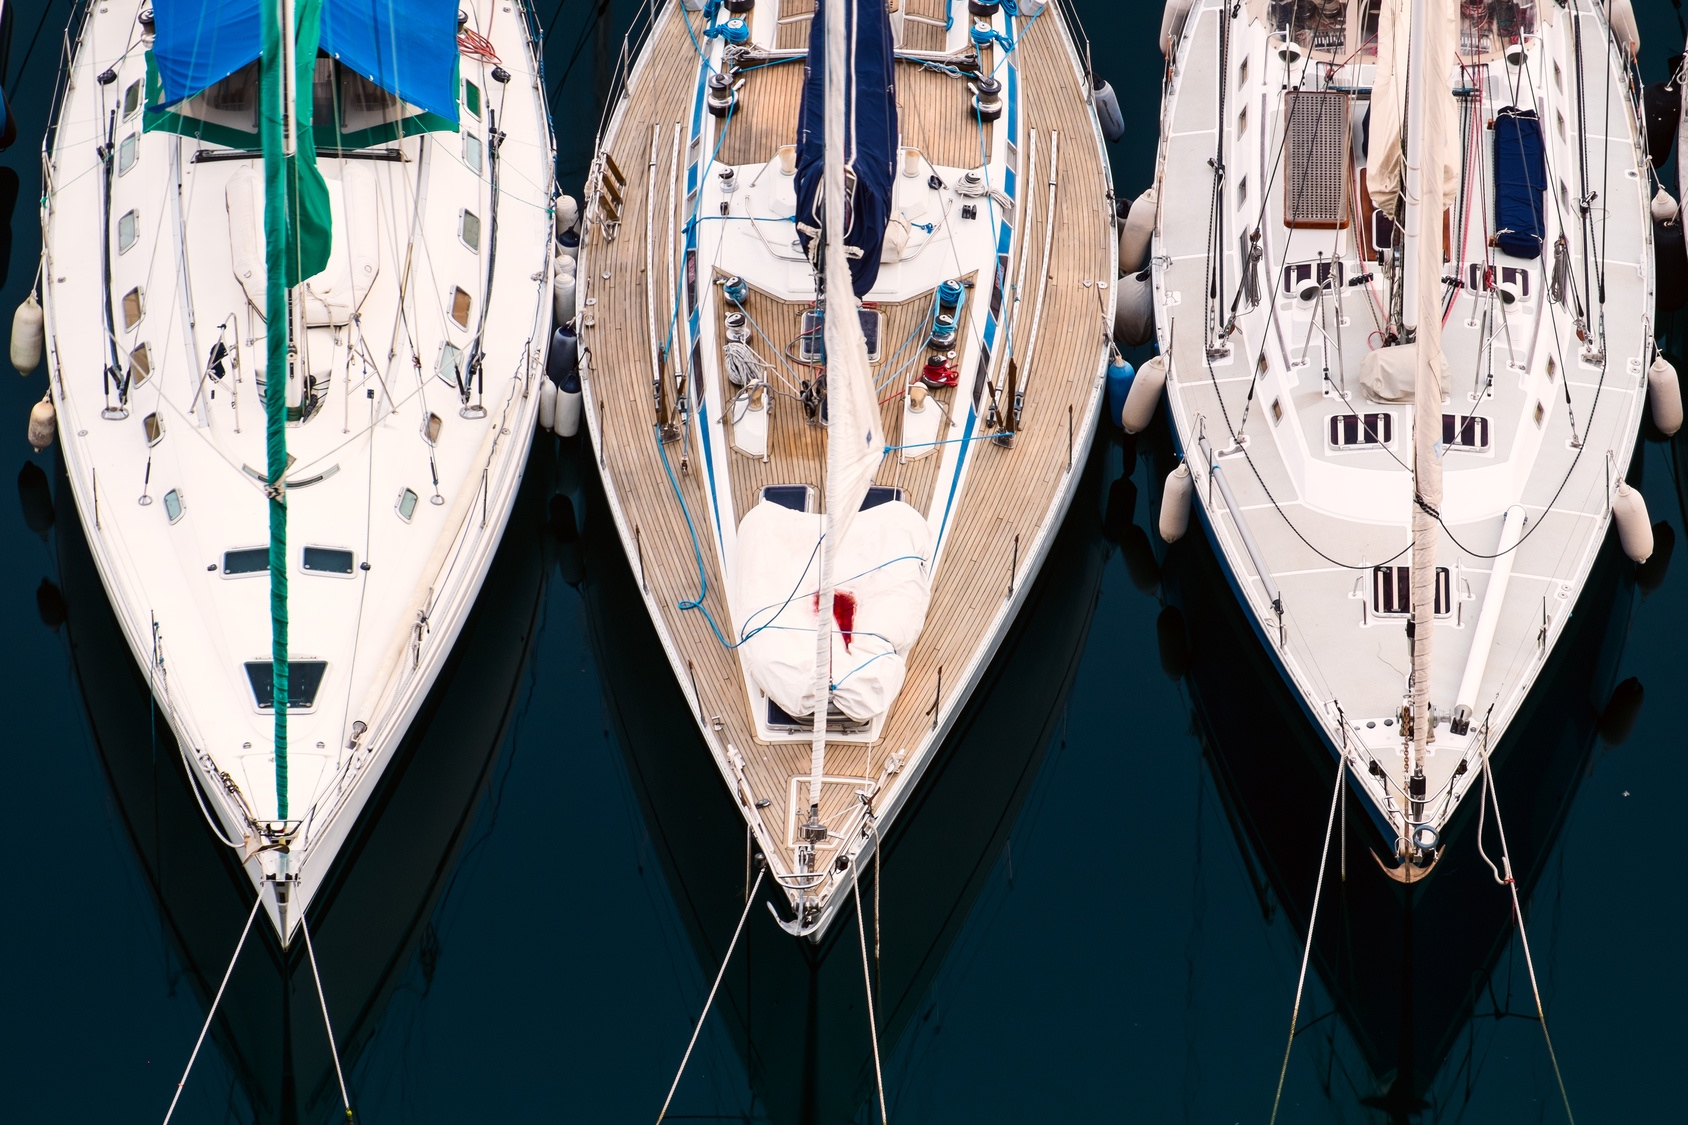 Antlos luxury yachts